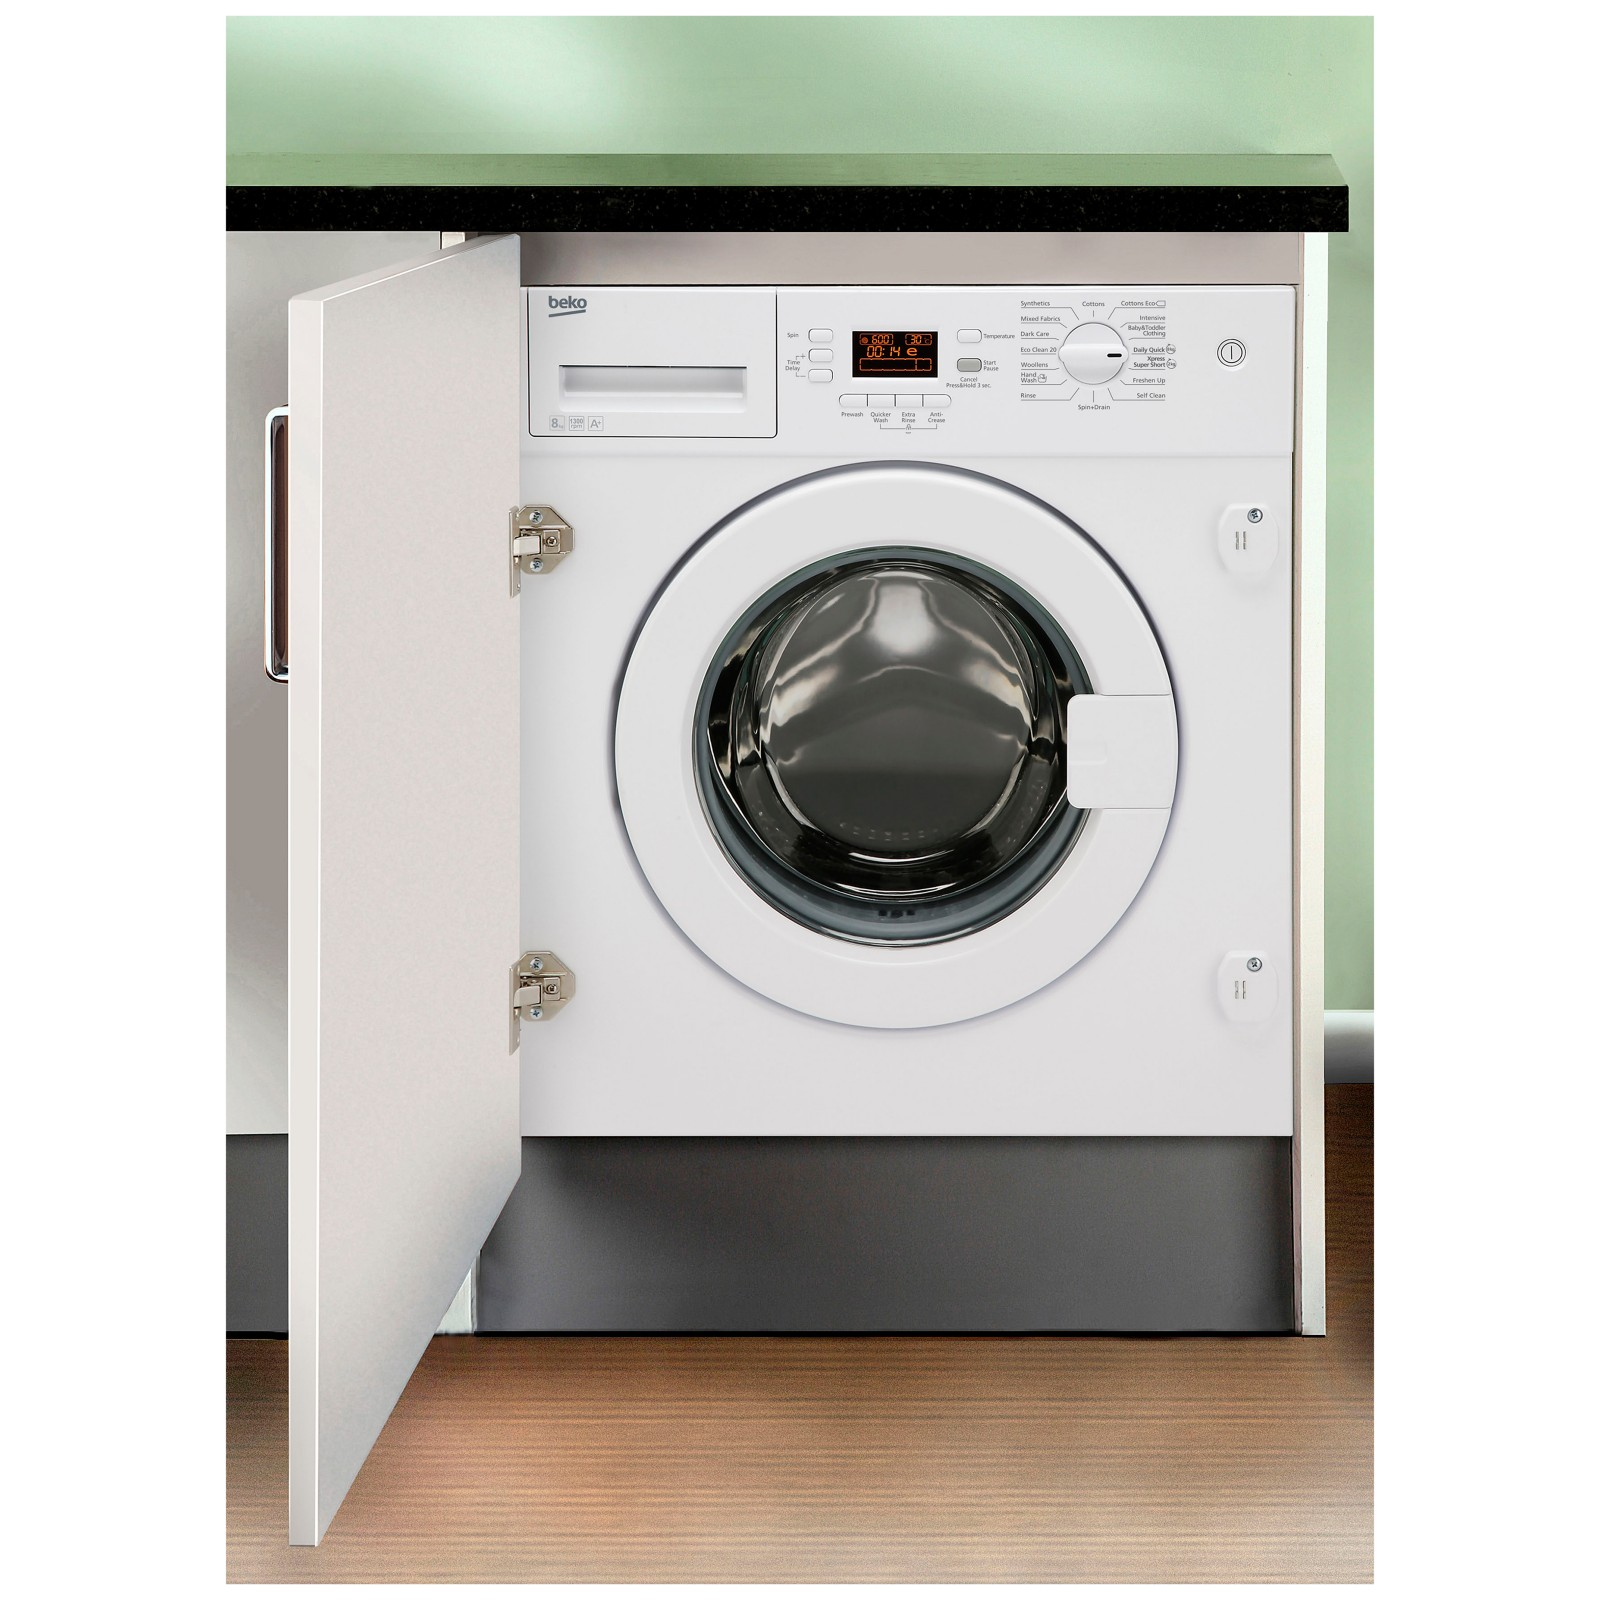 Beko WMI81341 Integrated Washing Machine